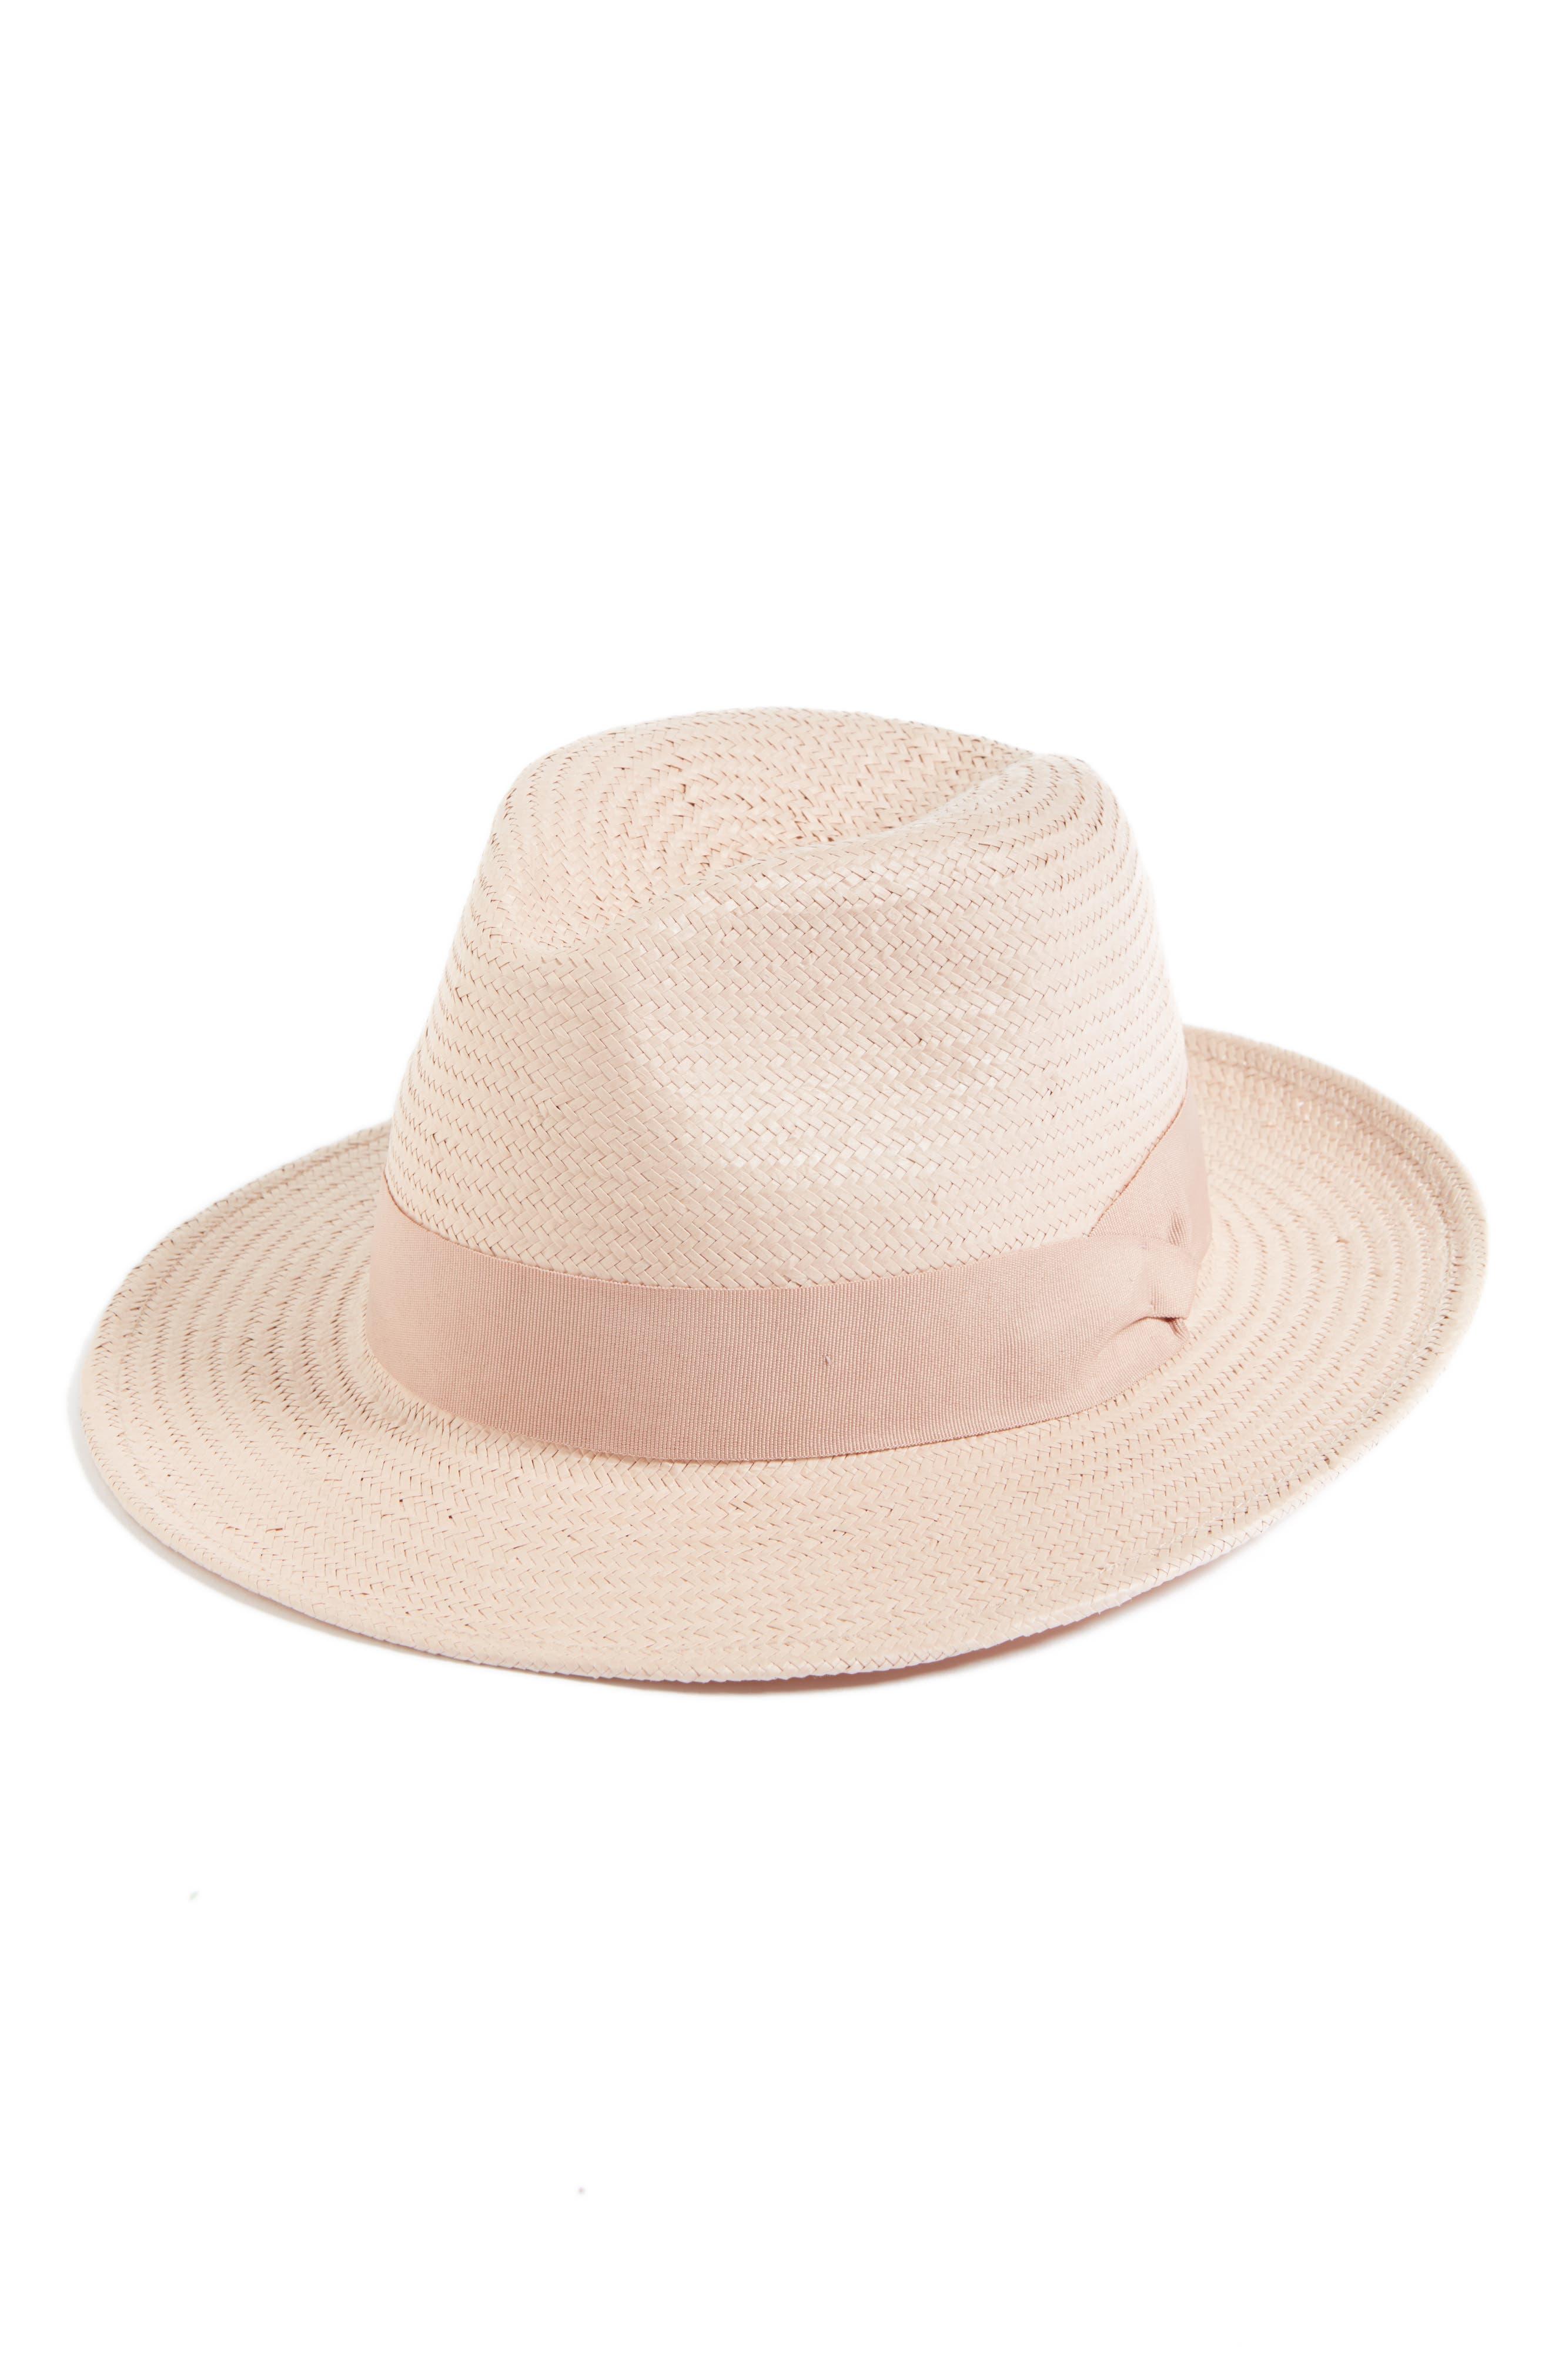 Straw Panama Hat,                         Main,                         color, Blush